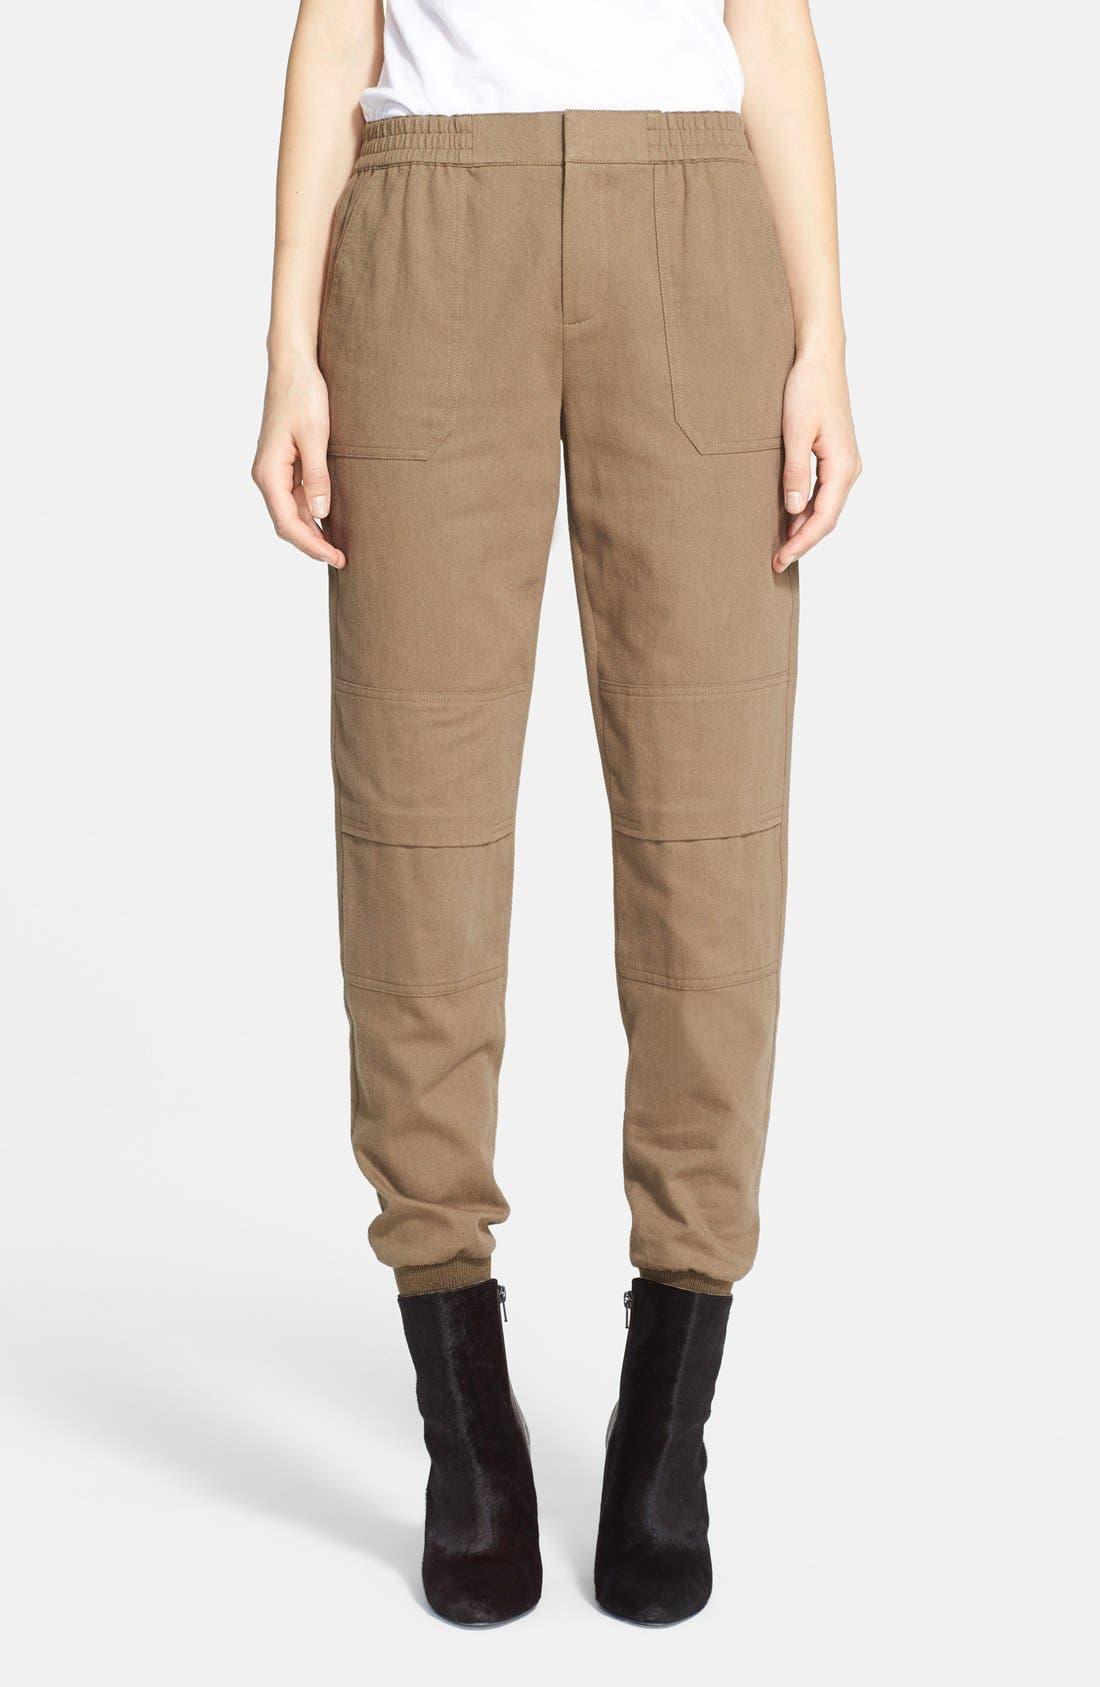 Alternate Image 1 Selected - Vince Flannel Cargo Jogger Pants